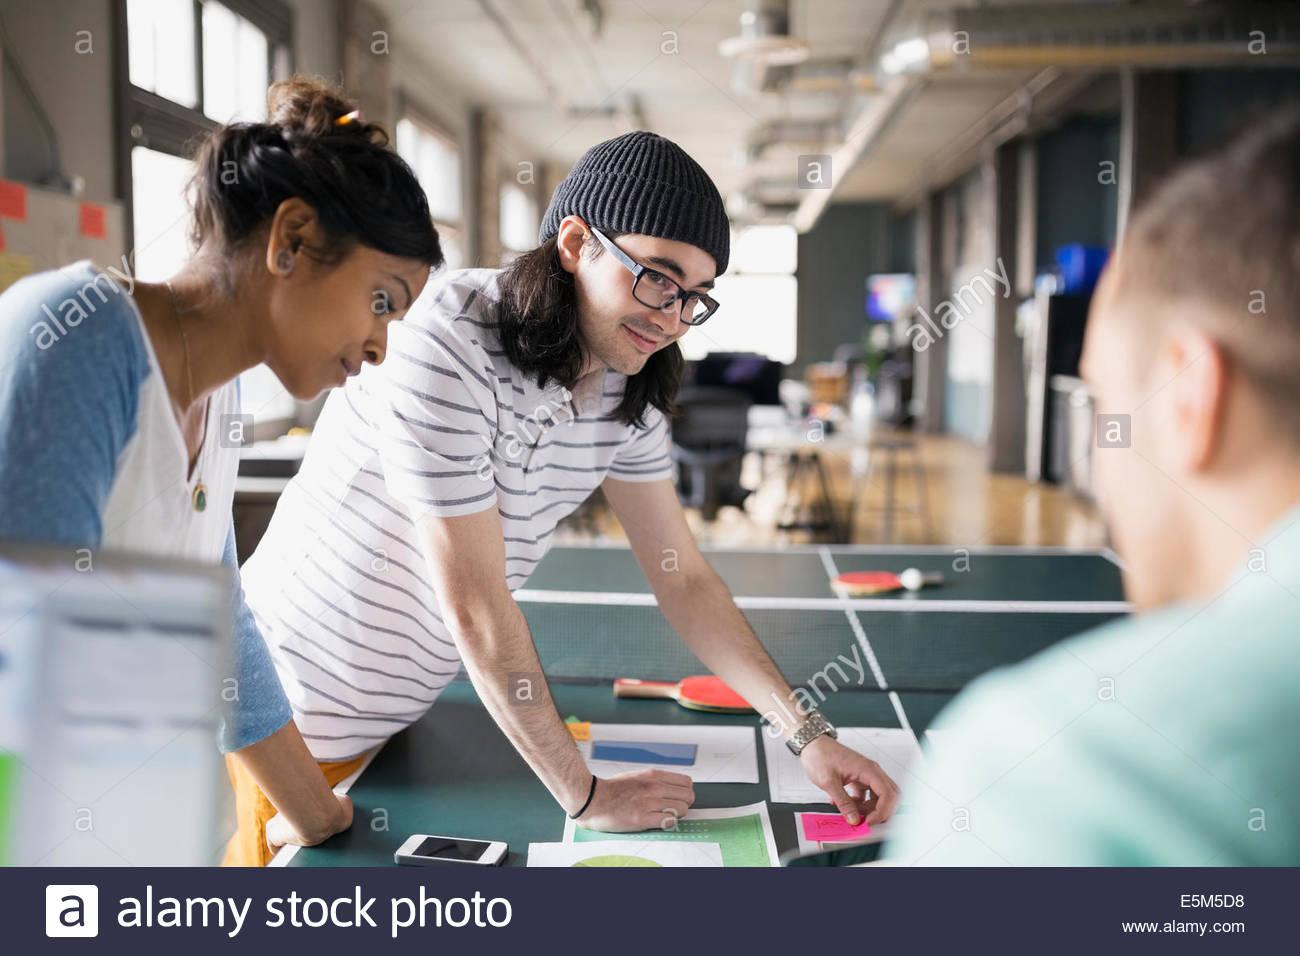 Reunión de gente de negocios creativos en Office Imagen De Stock